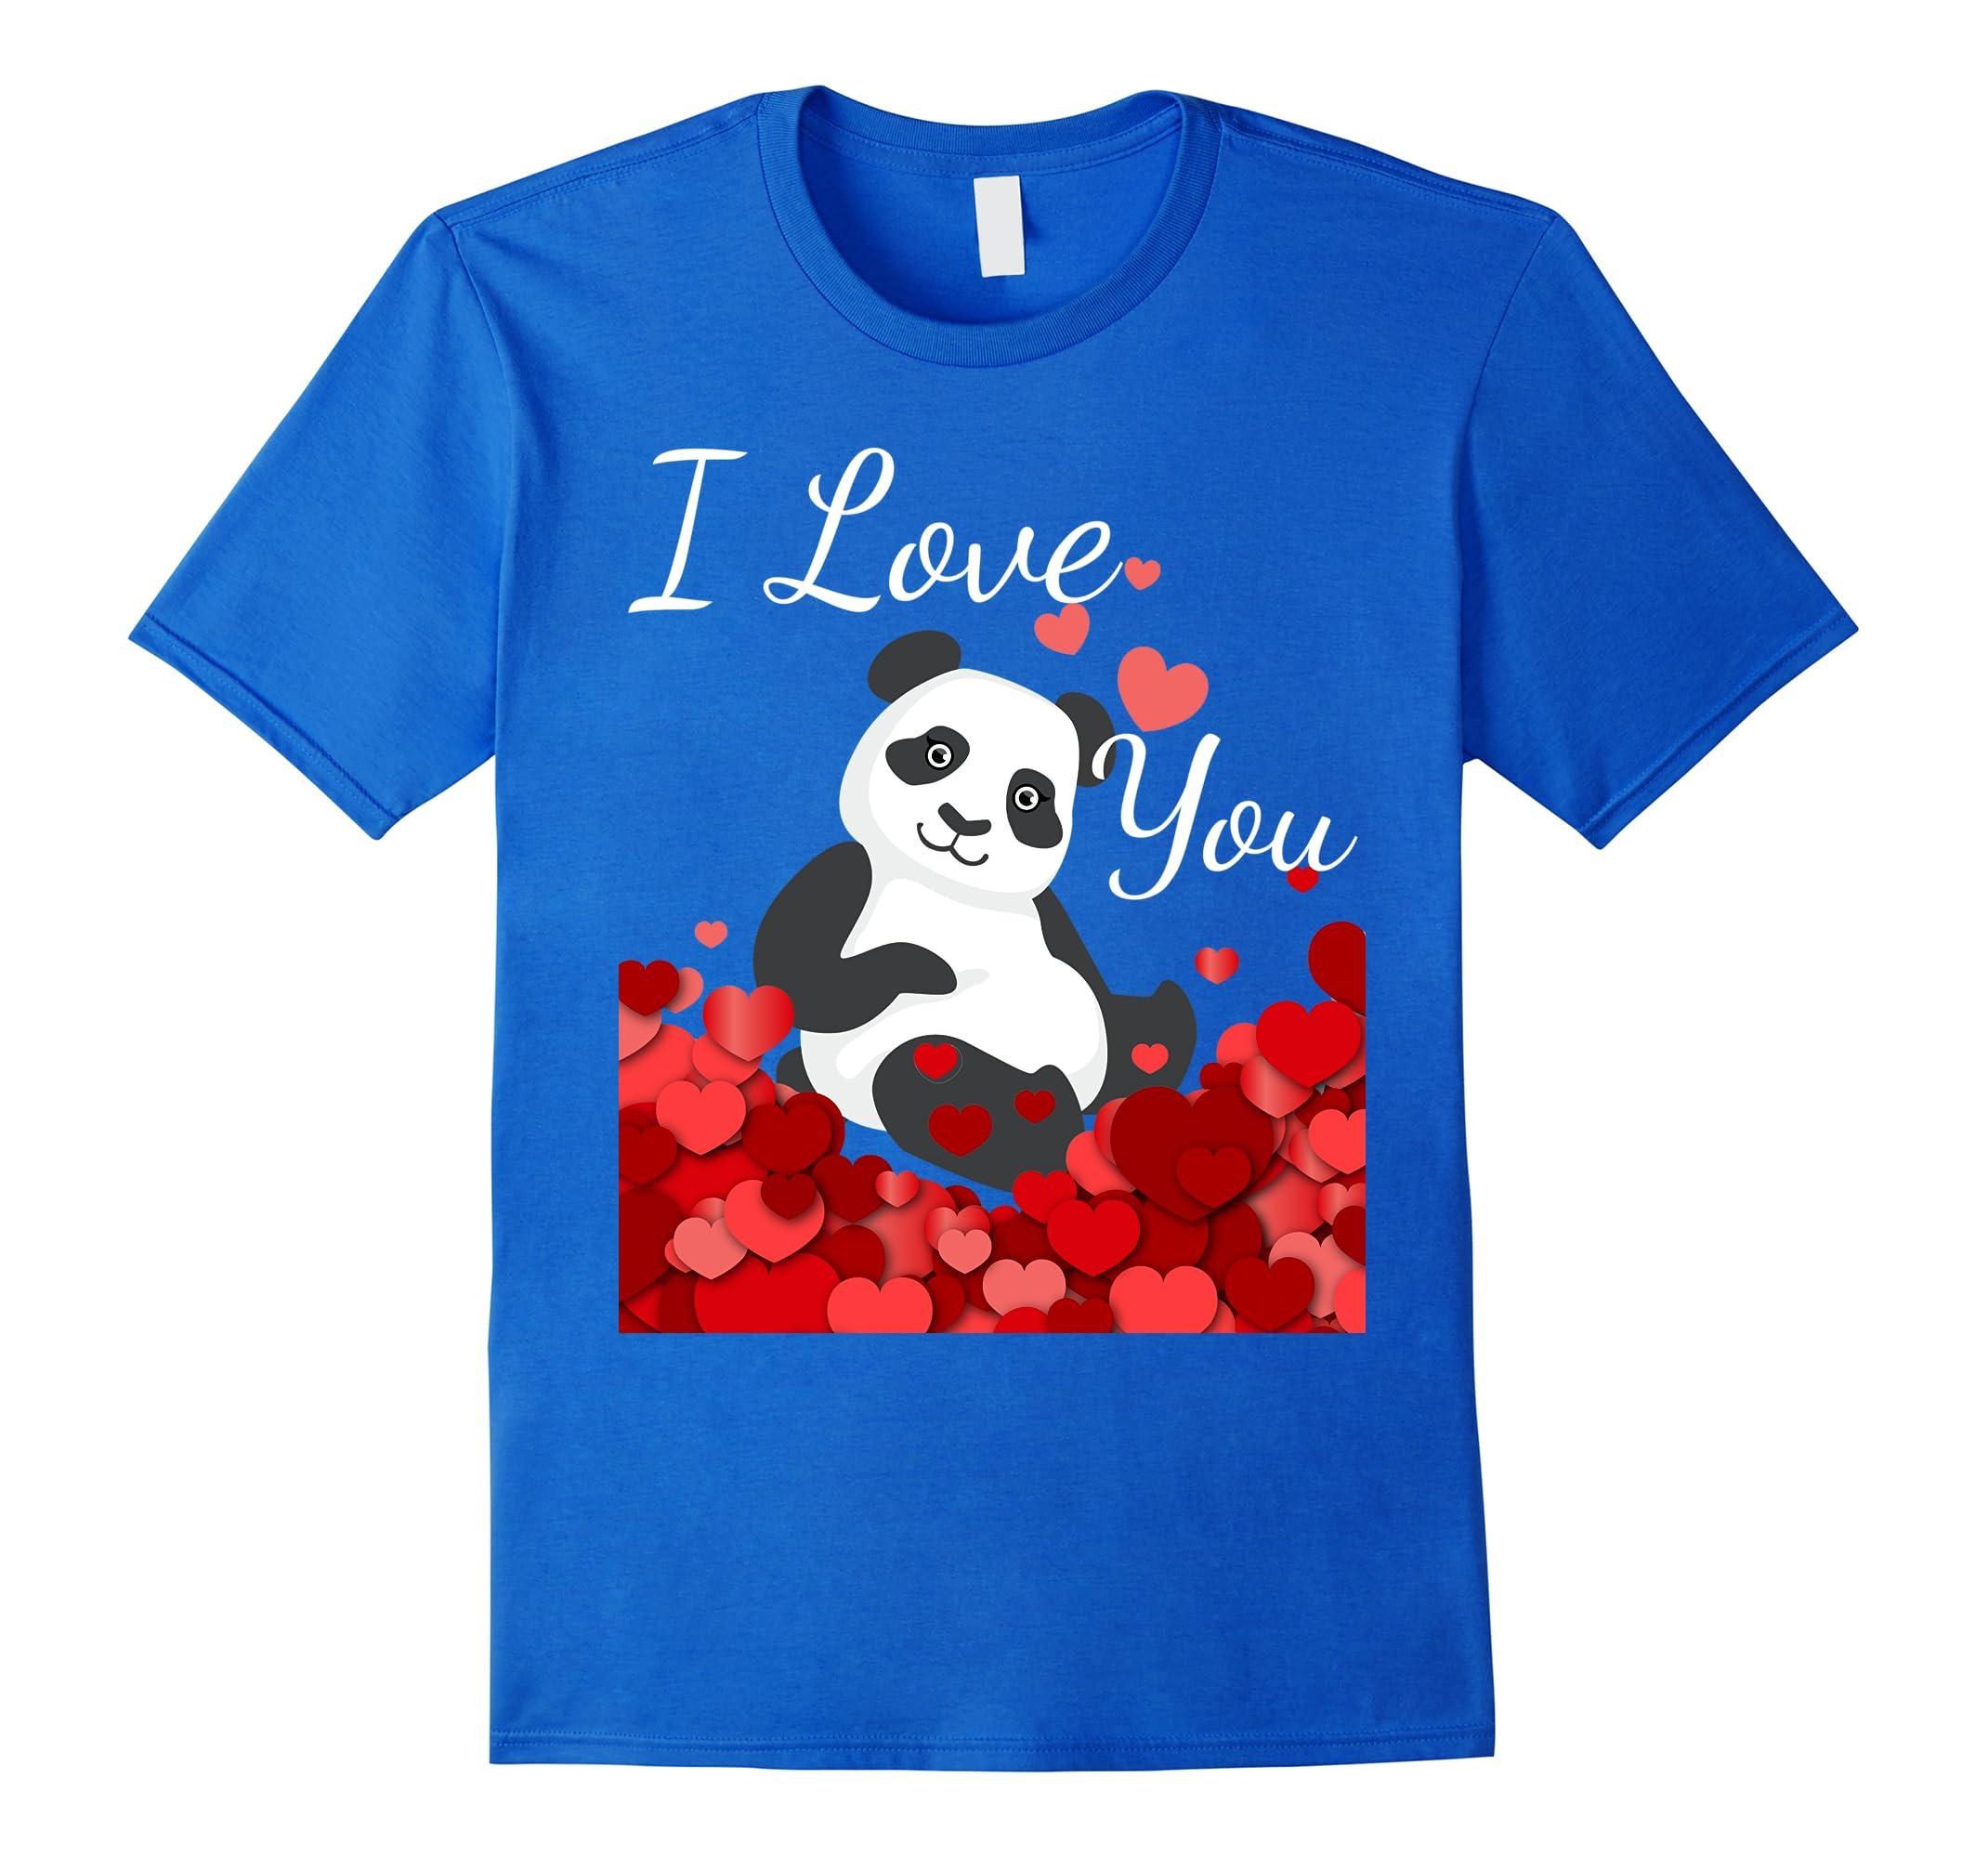 I Love You Cute Panda Valentine S Day T Shirt Ah My Shirt One